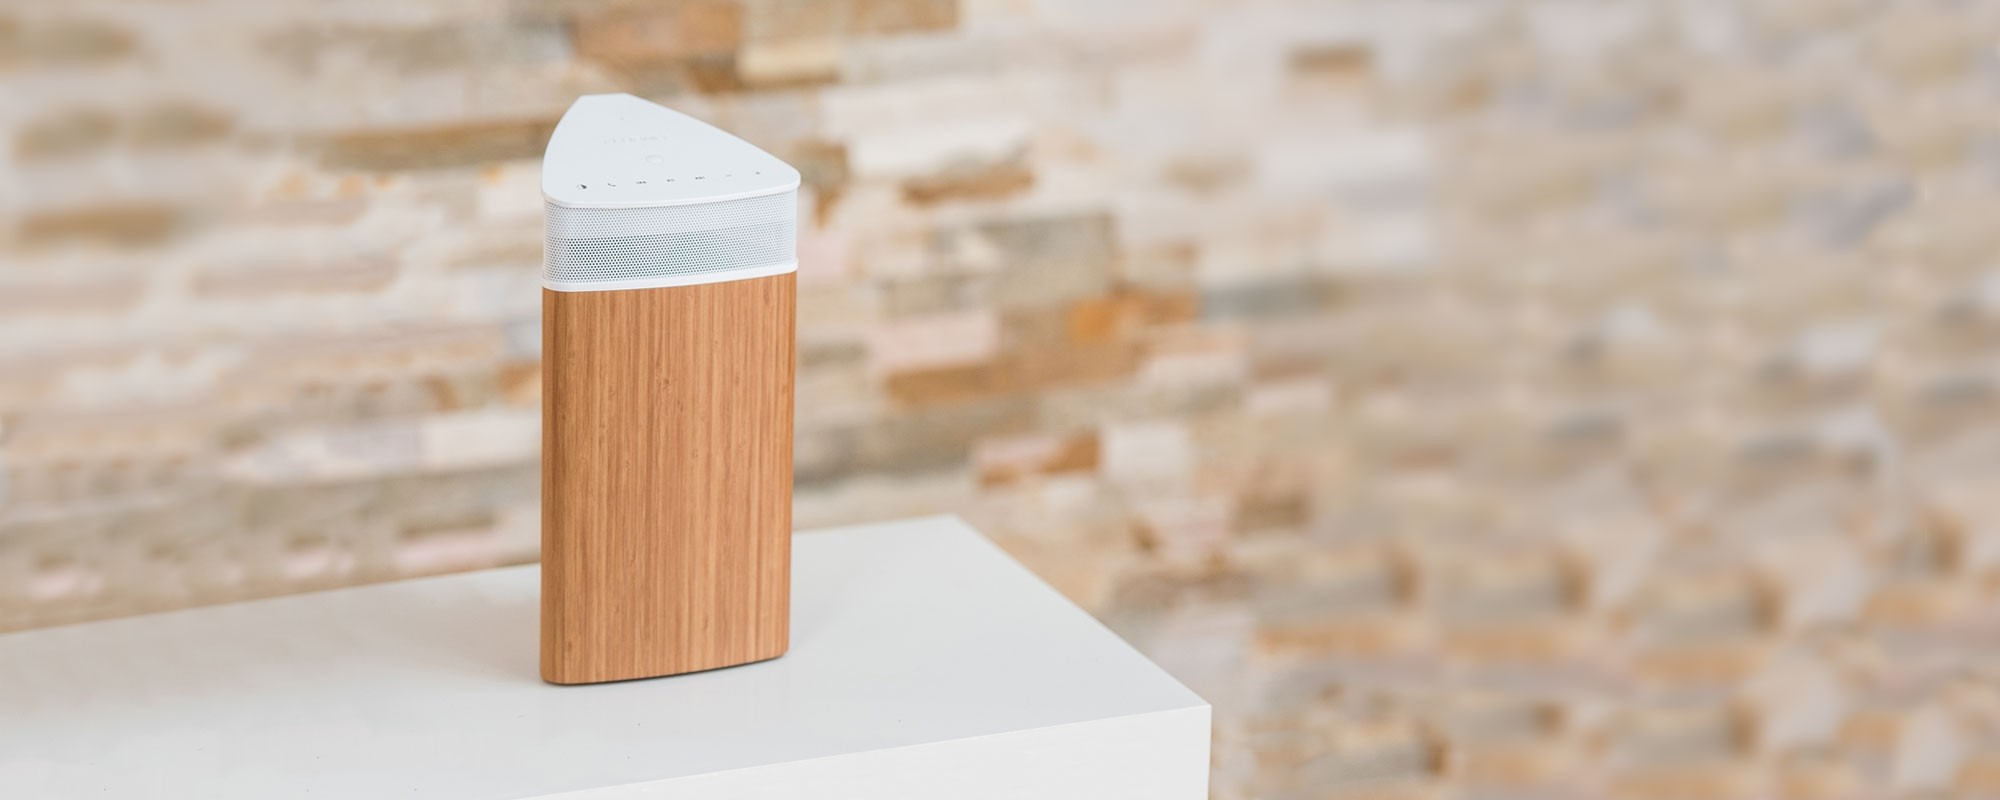 Fi20 High Performance Portable Wireless 360 Degree Speaker - Lucky Bamboo